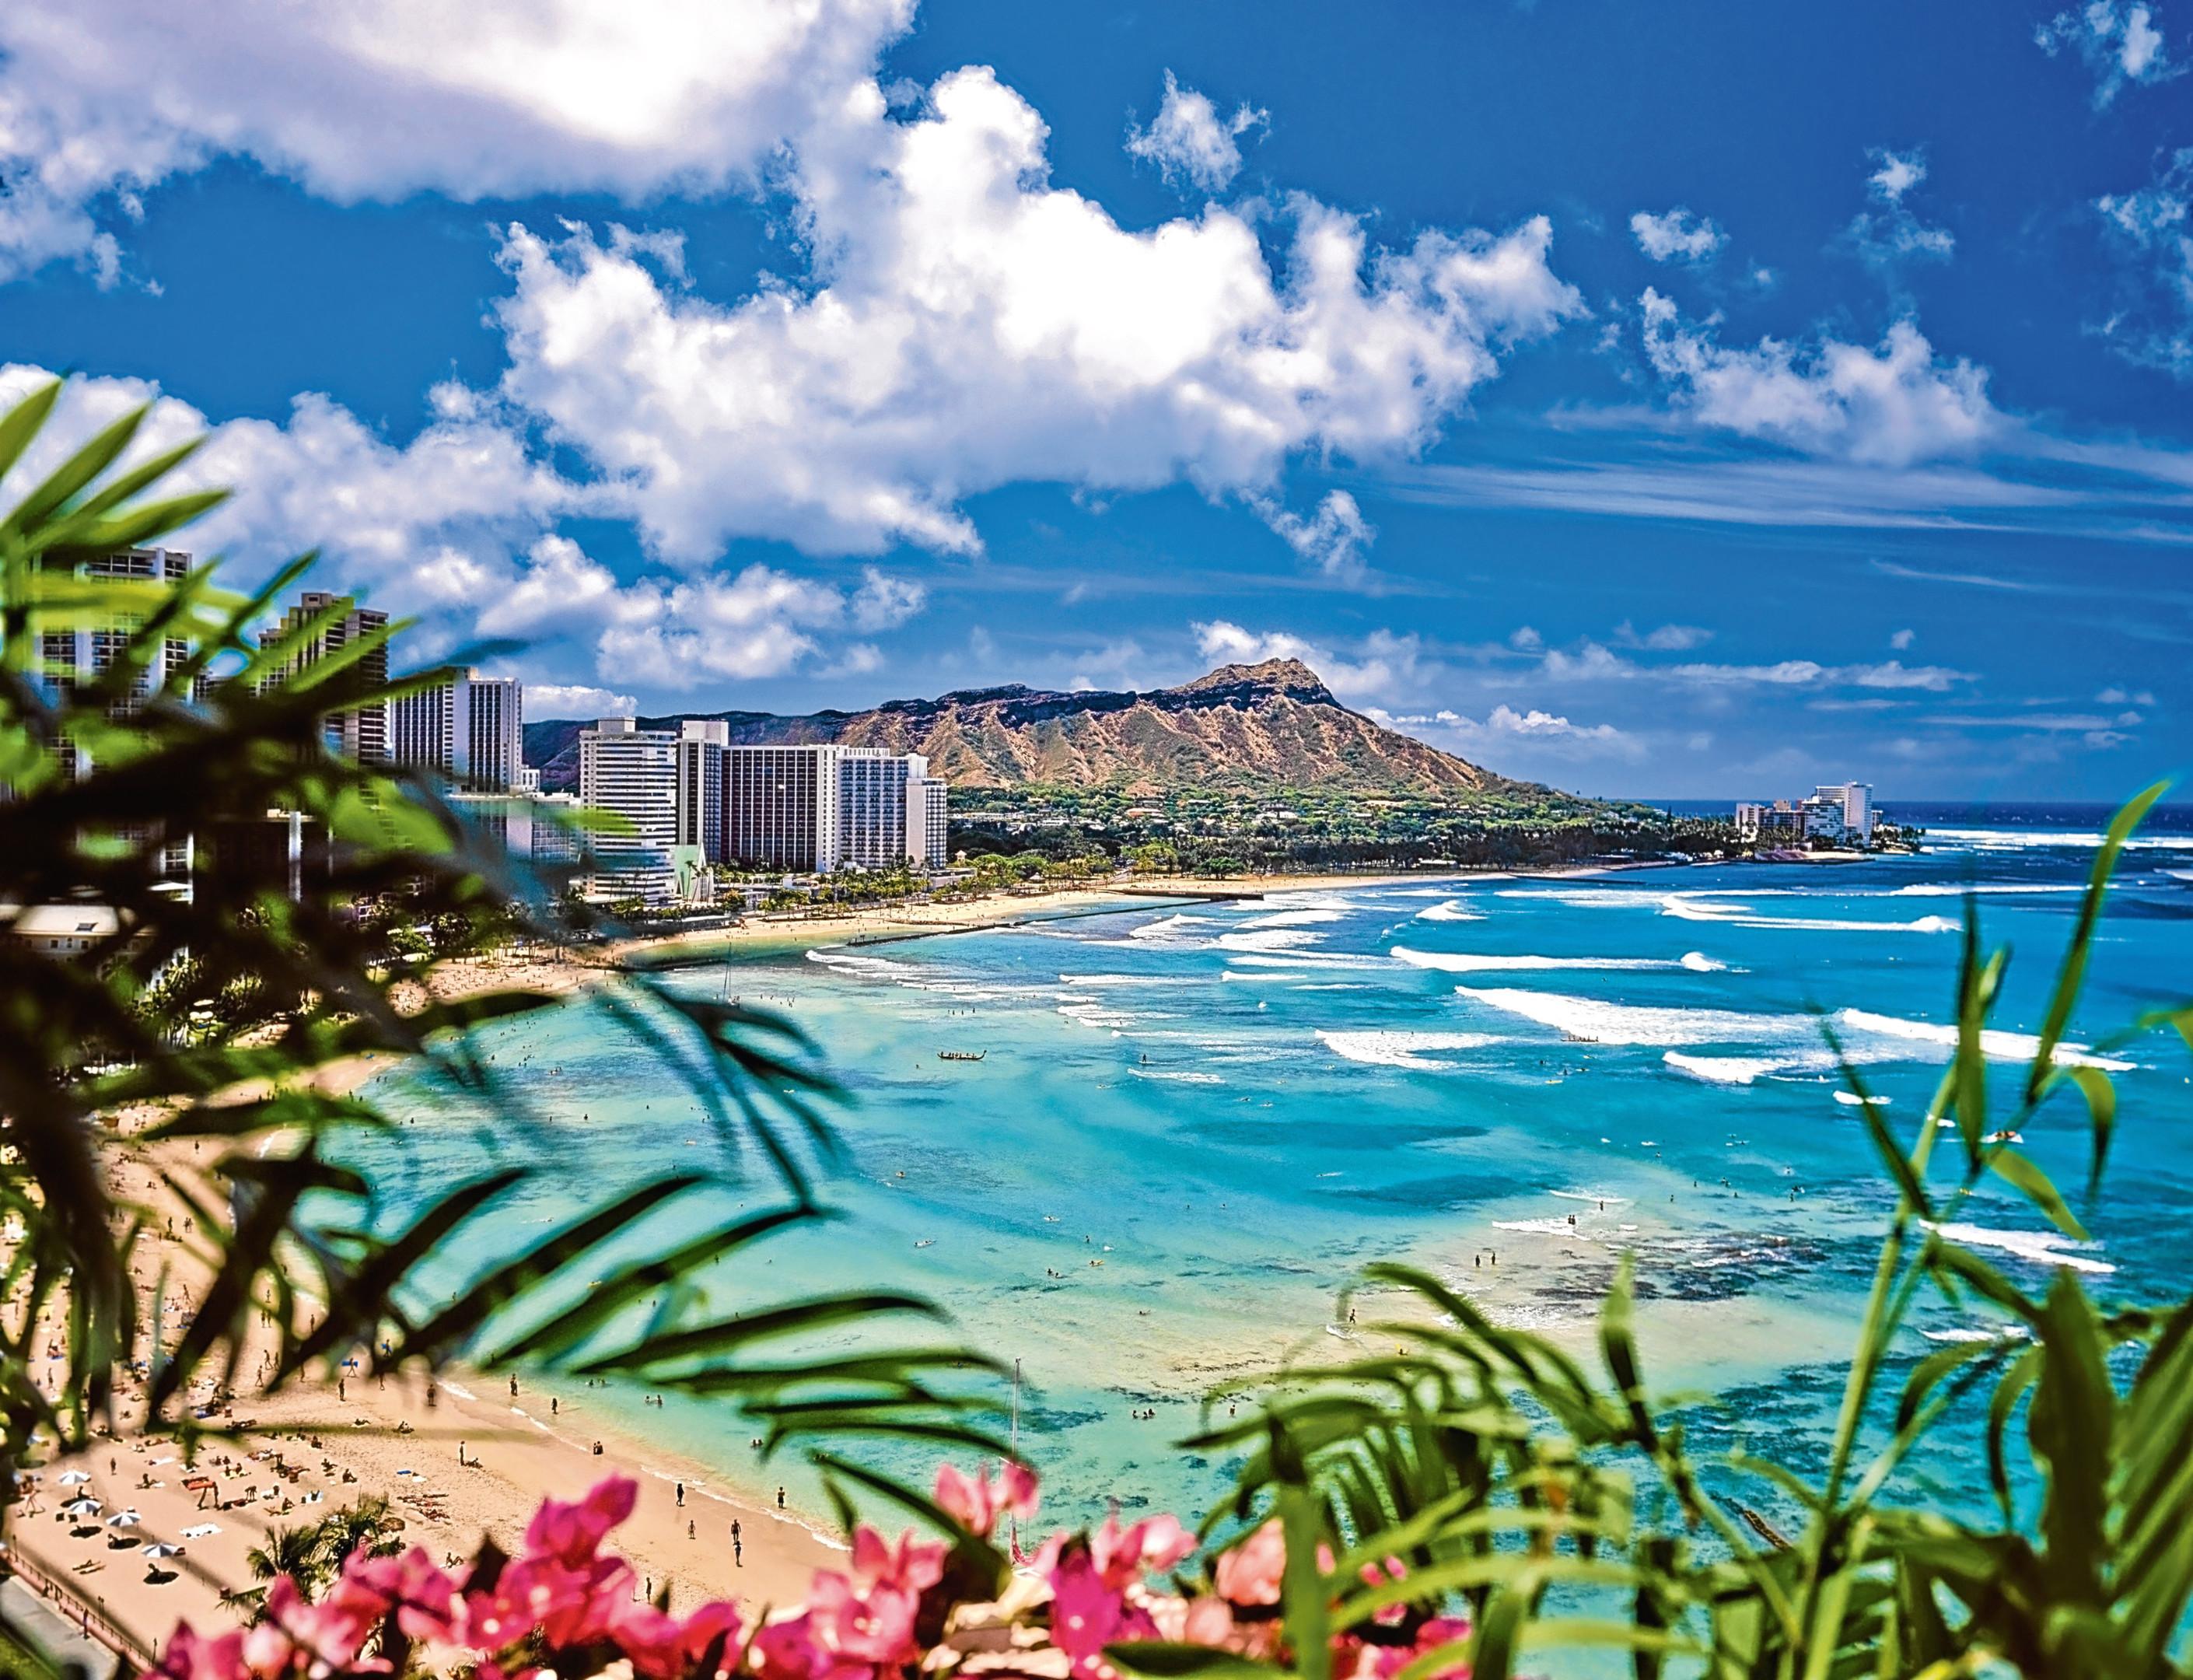 Waikiki beach and diamond head in Hawaii (Getty Images/iStock)